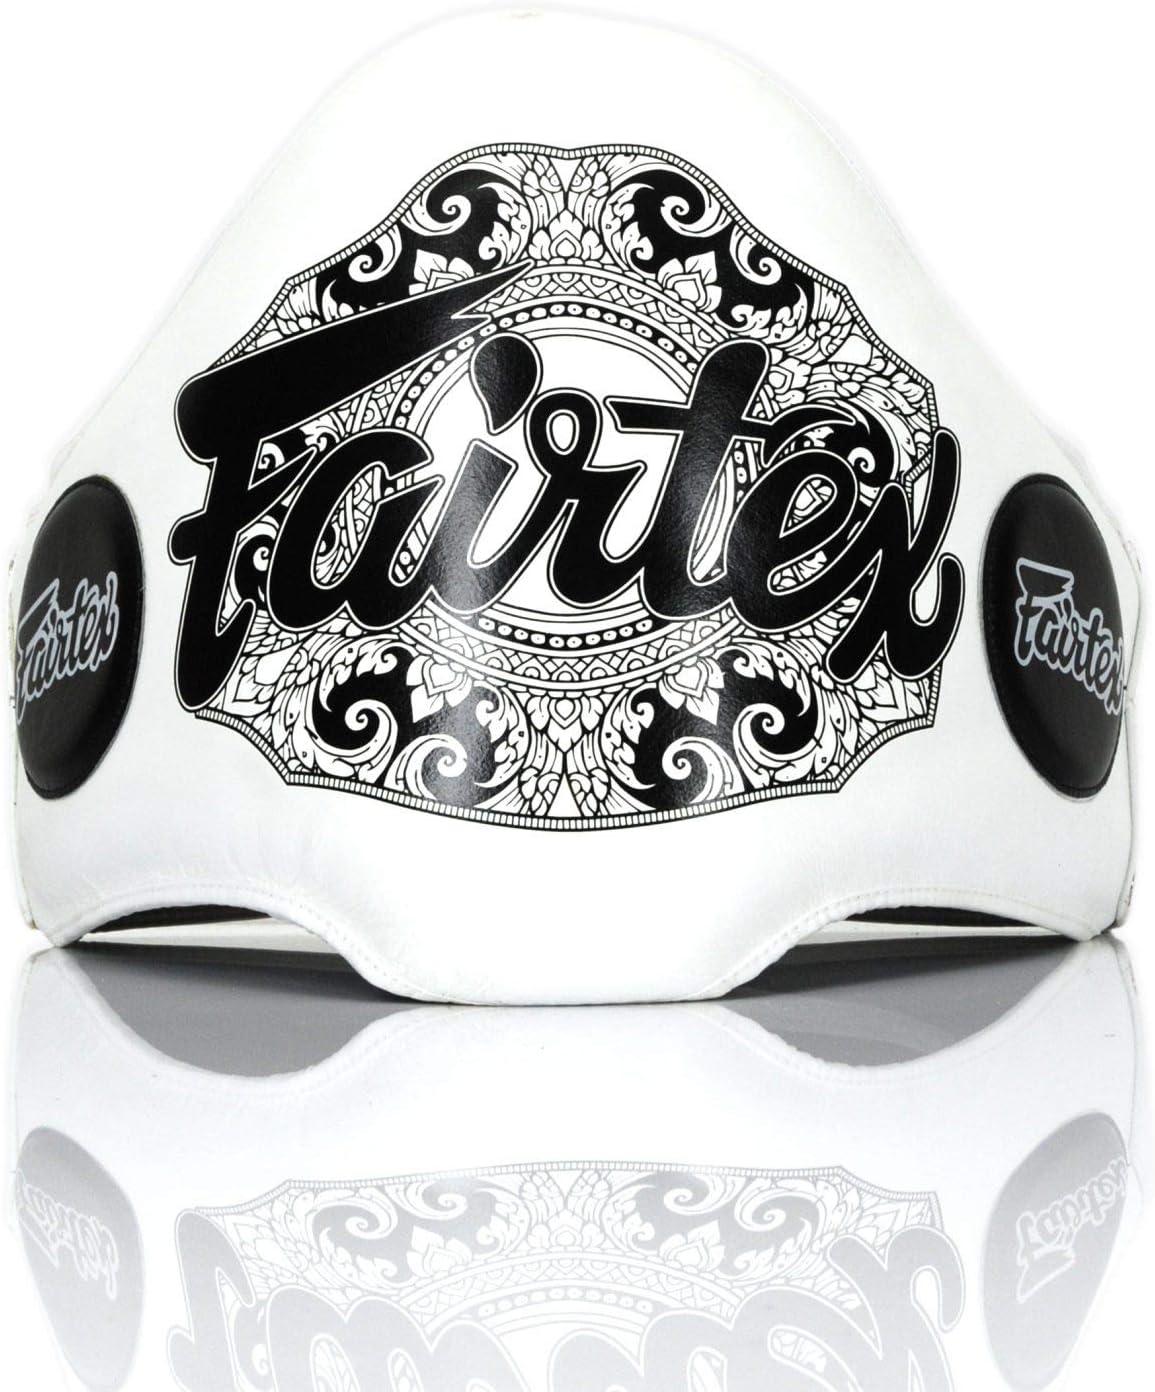 Fairtex Champion BPV2 Cintur/ón de entrenamiento para Muay Thai